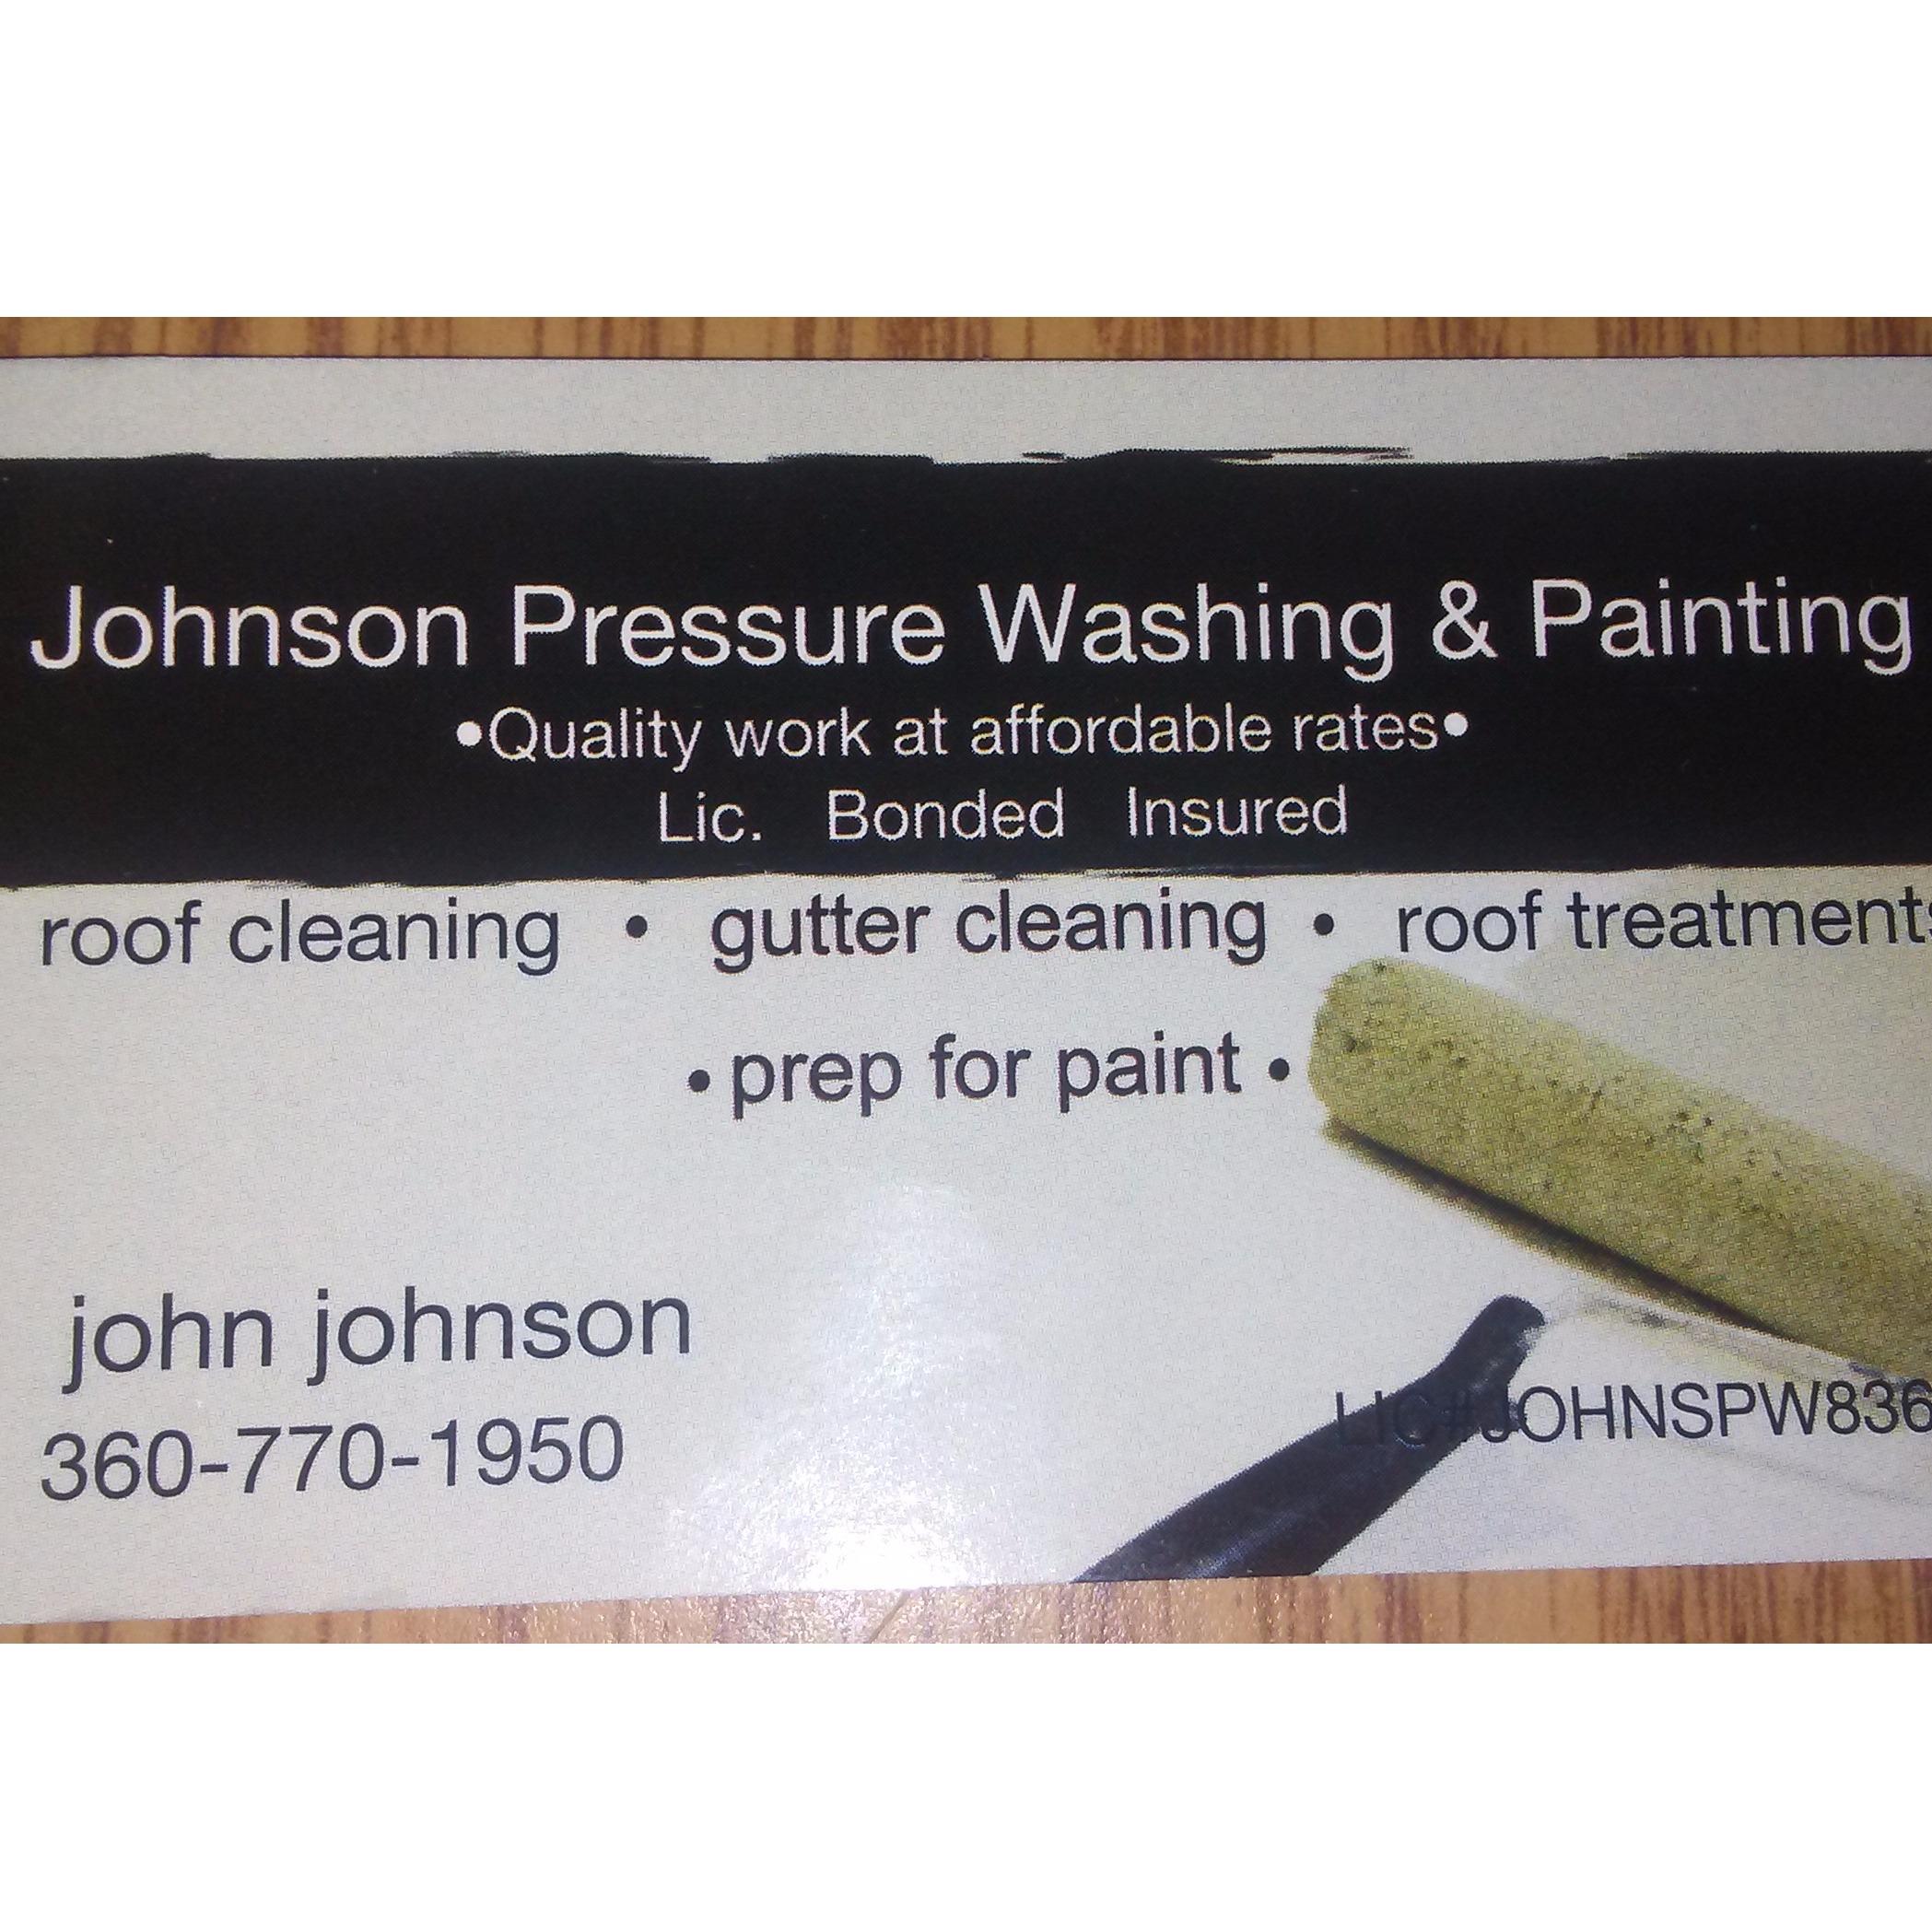 Johnson Pressure Washing & Painting